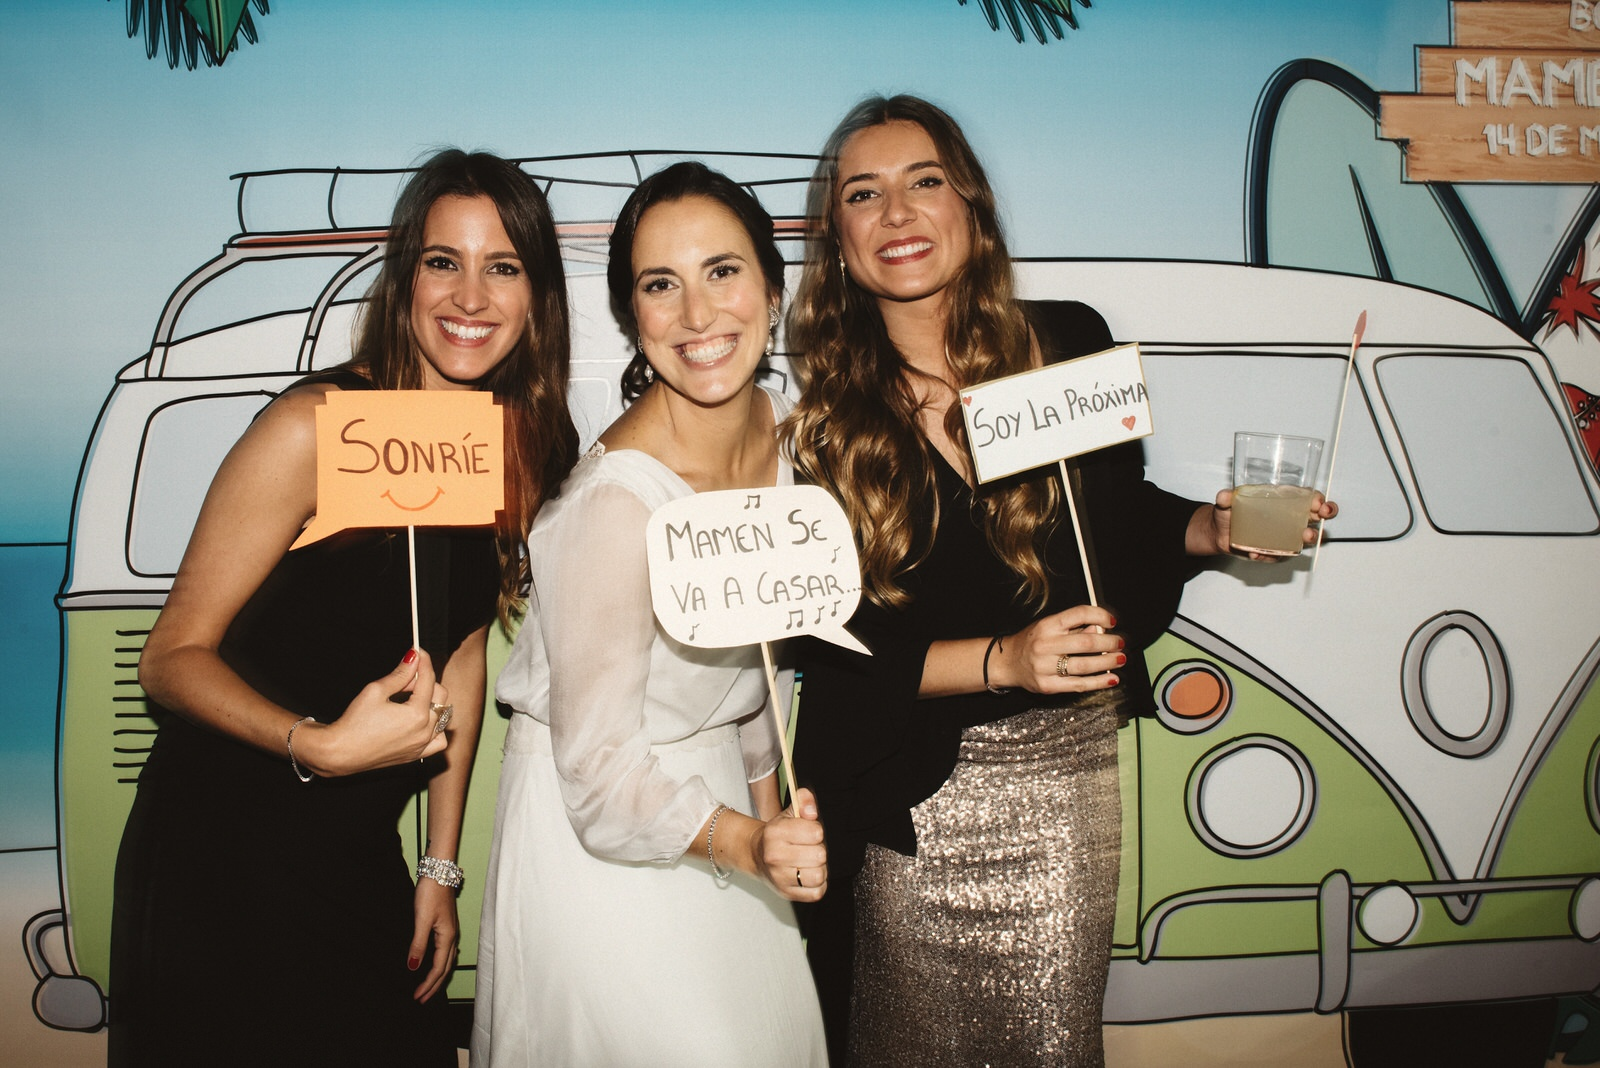 fotografo de bodas sevilla - fotografo boda - fotografía sevilla - Andrés AmarilloAAA_3653- fine.JPG